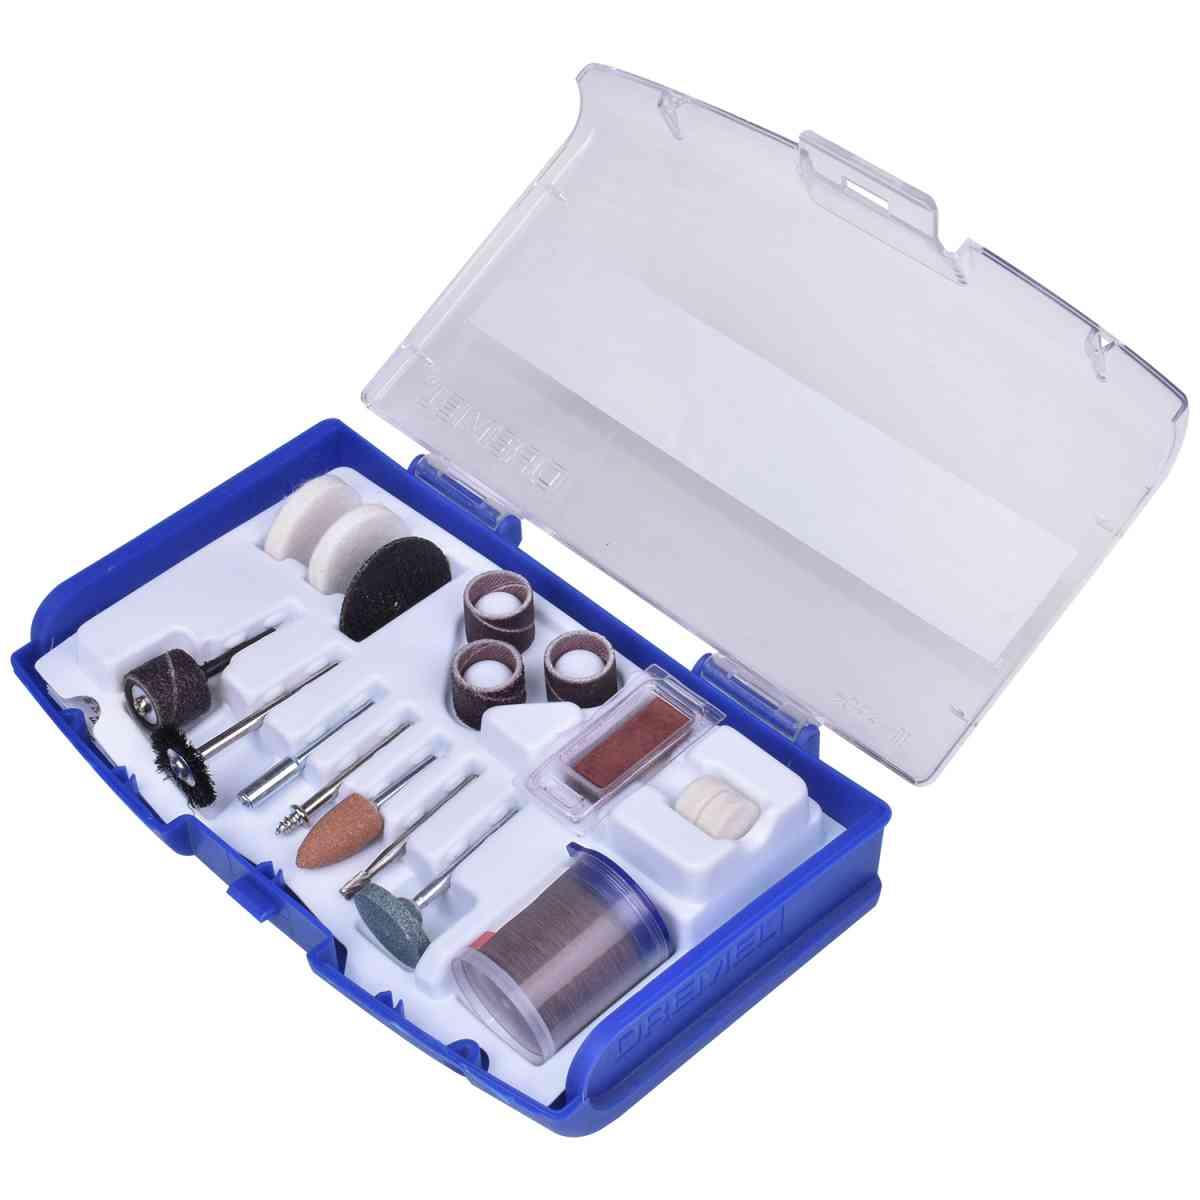 Kit De Mini Retífica 52 Peças Para Uso Geral 687- 01 Dremel